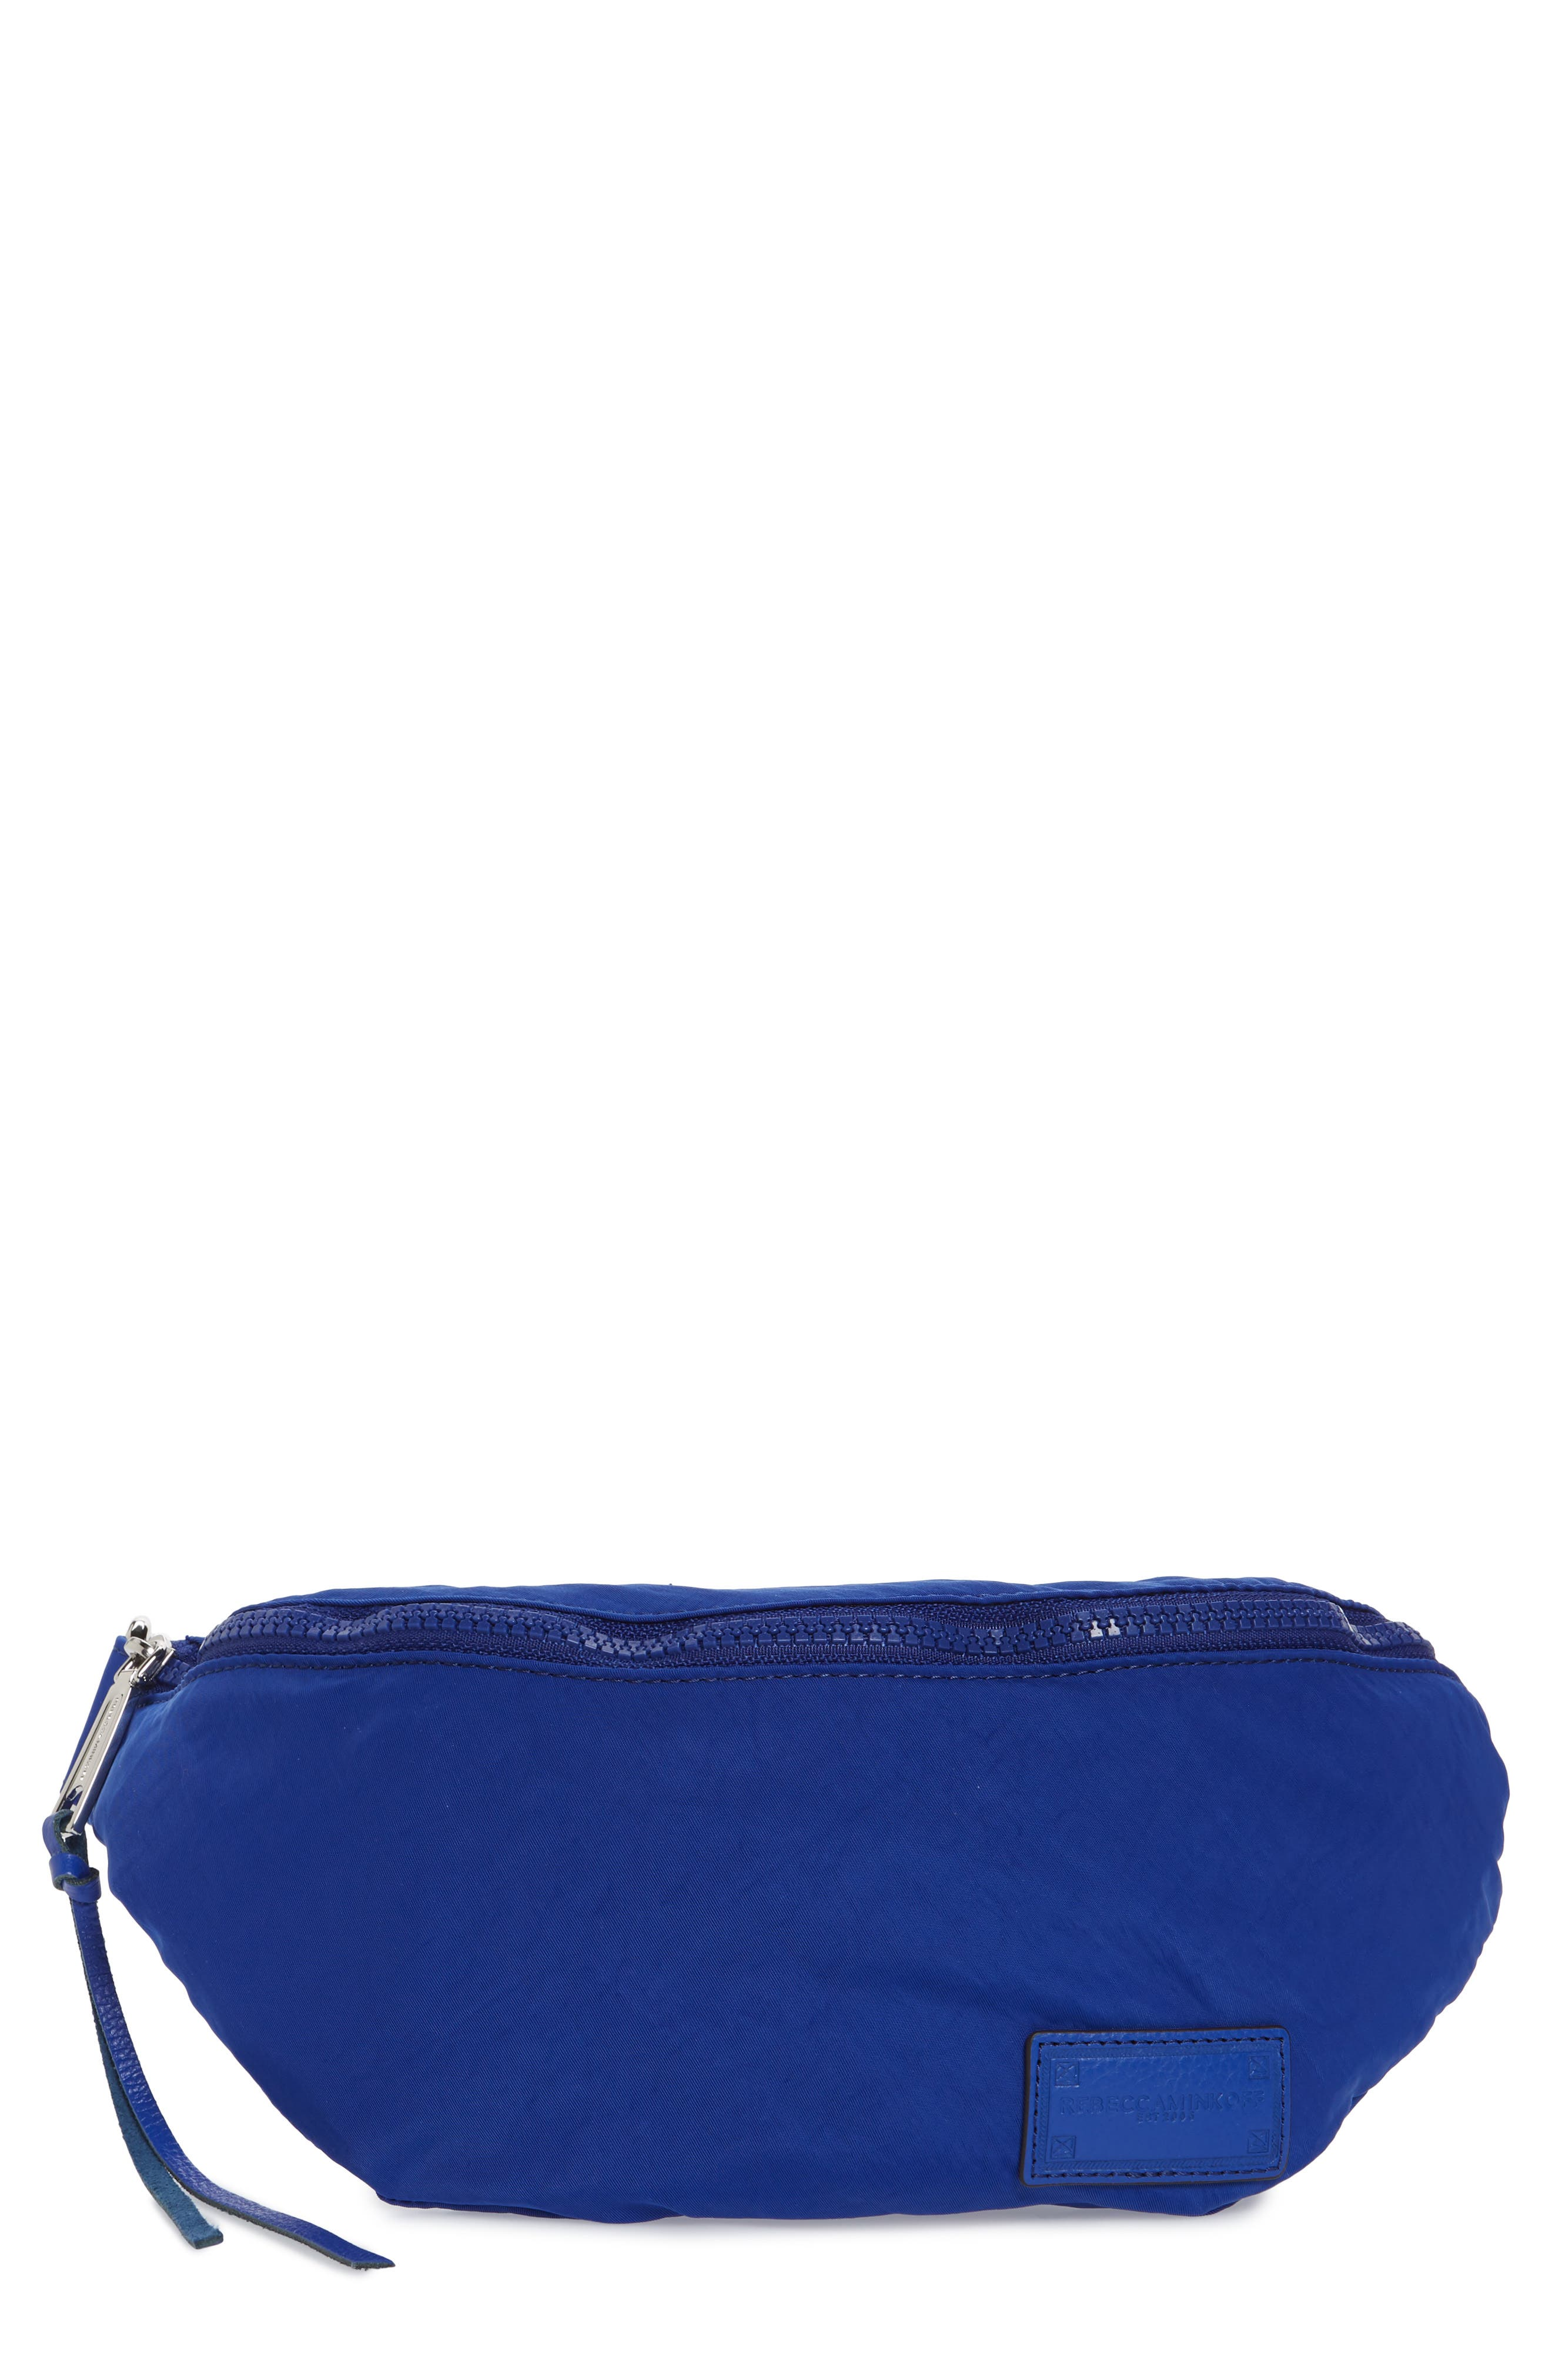 REBECCA MINKOFF Nylon Belt Bag, Main, color, BRIGHT BLUE